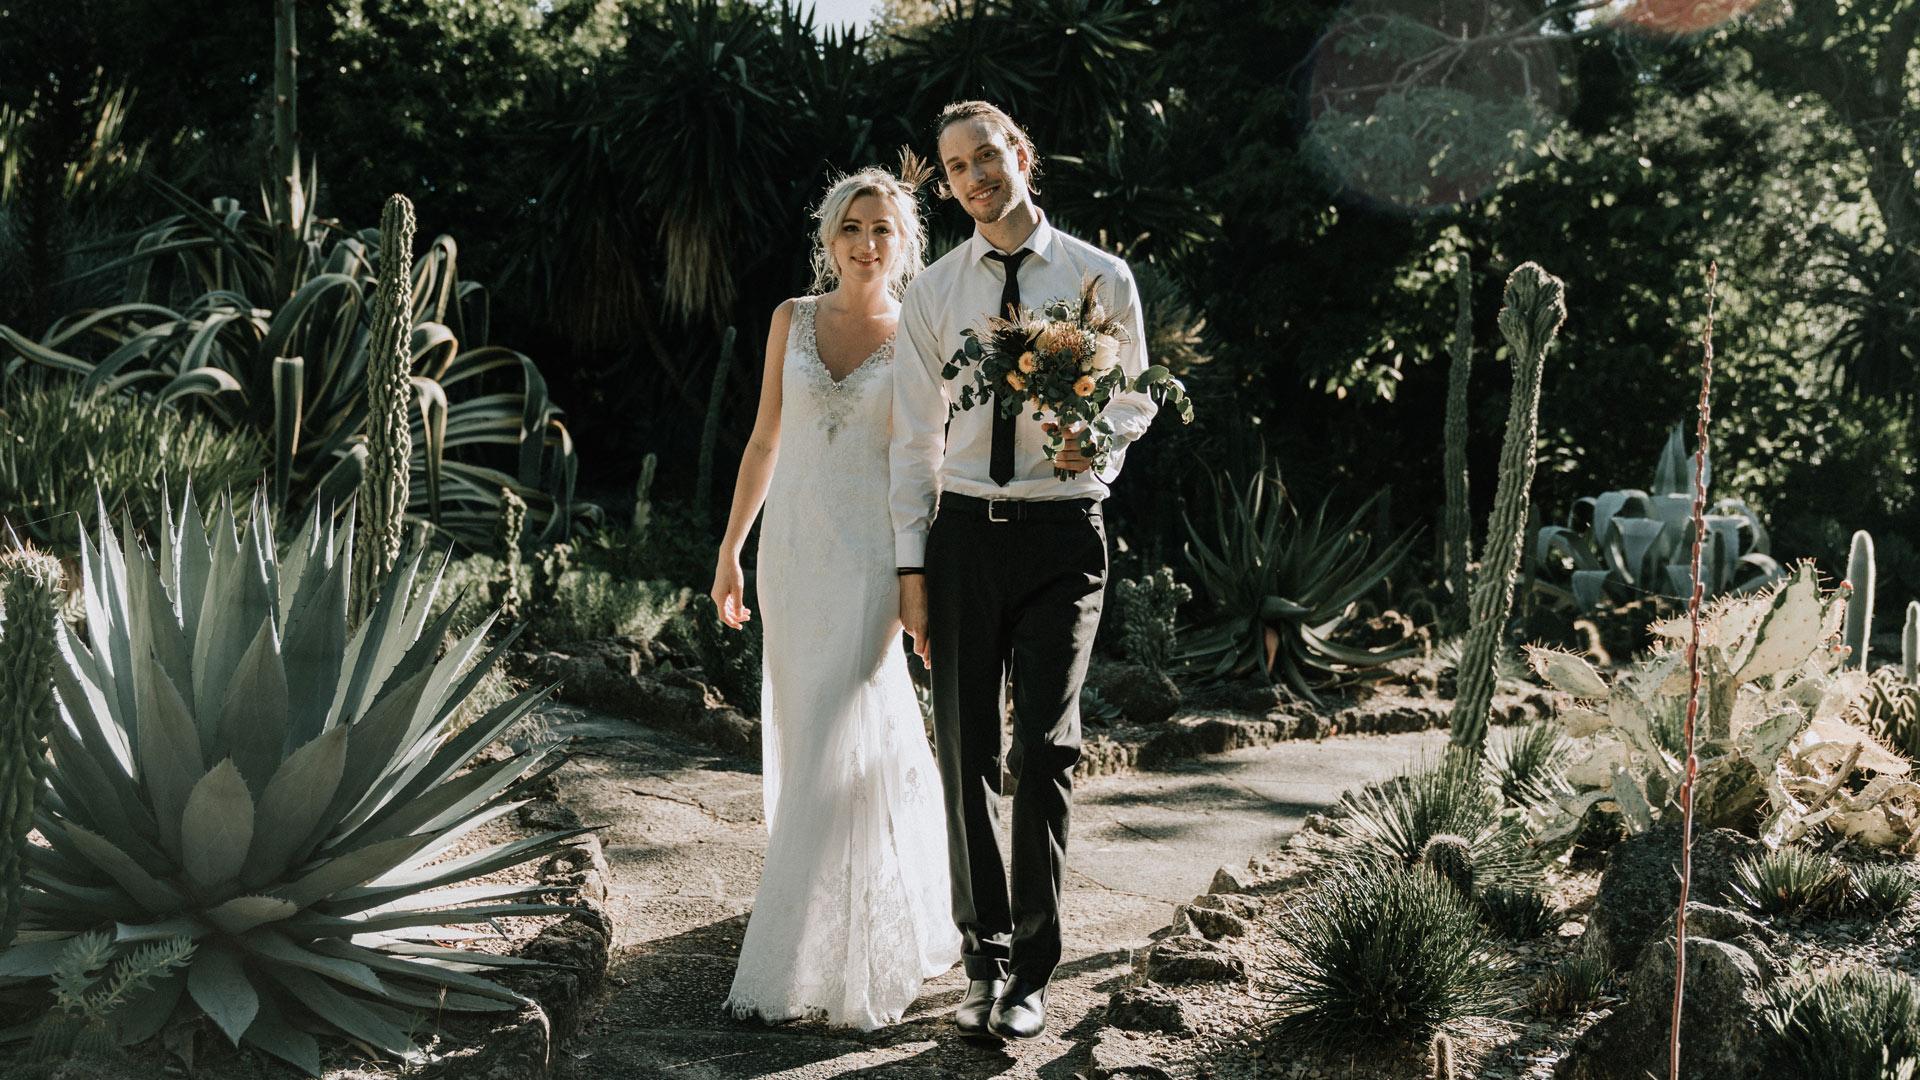 wedding photographers Melbourne image of boho bride and groom walking across Royal Botanical Gardens